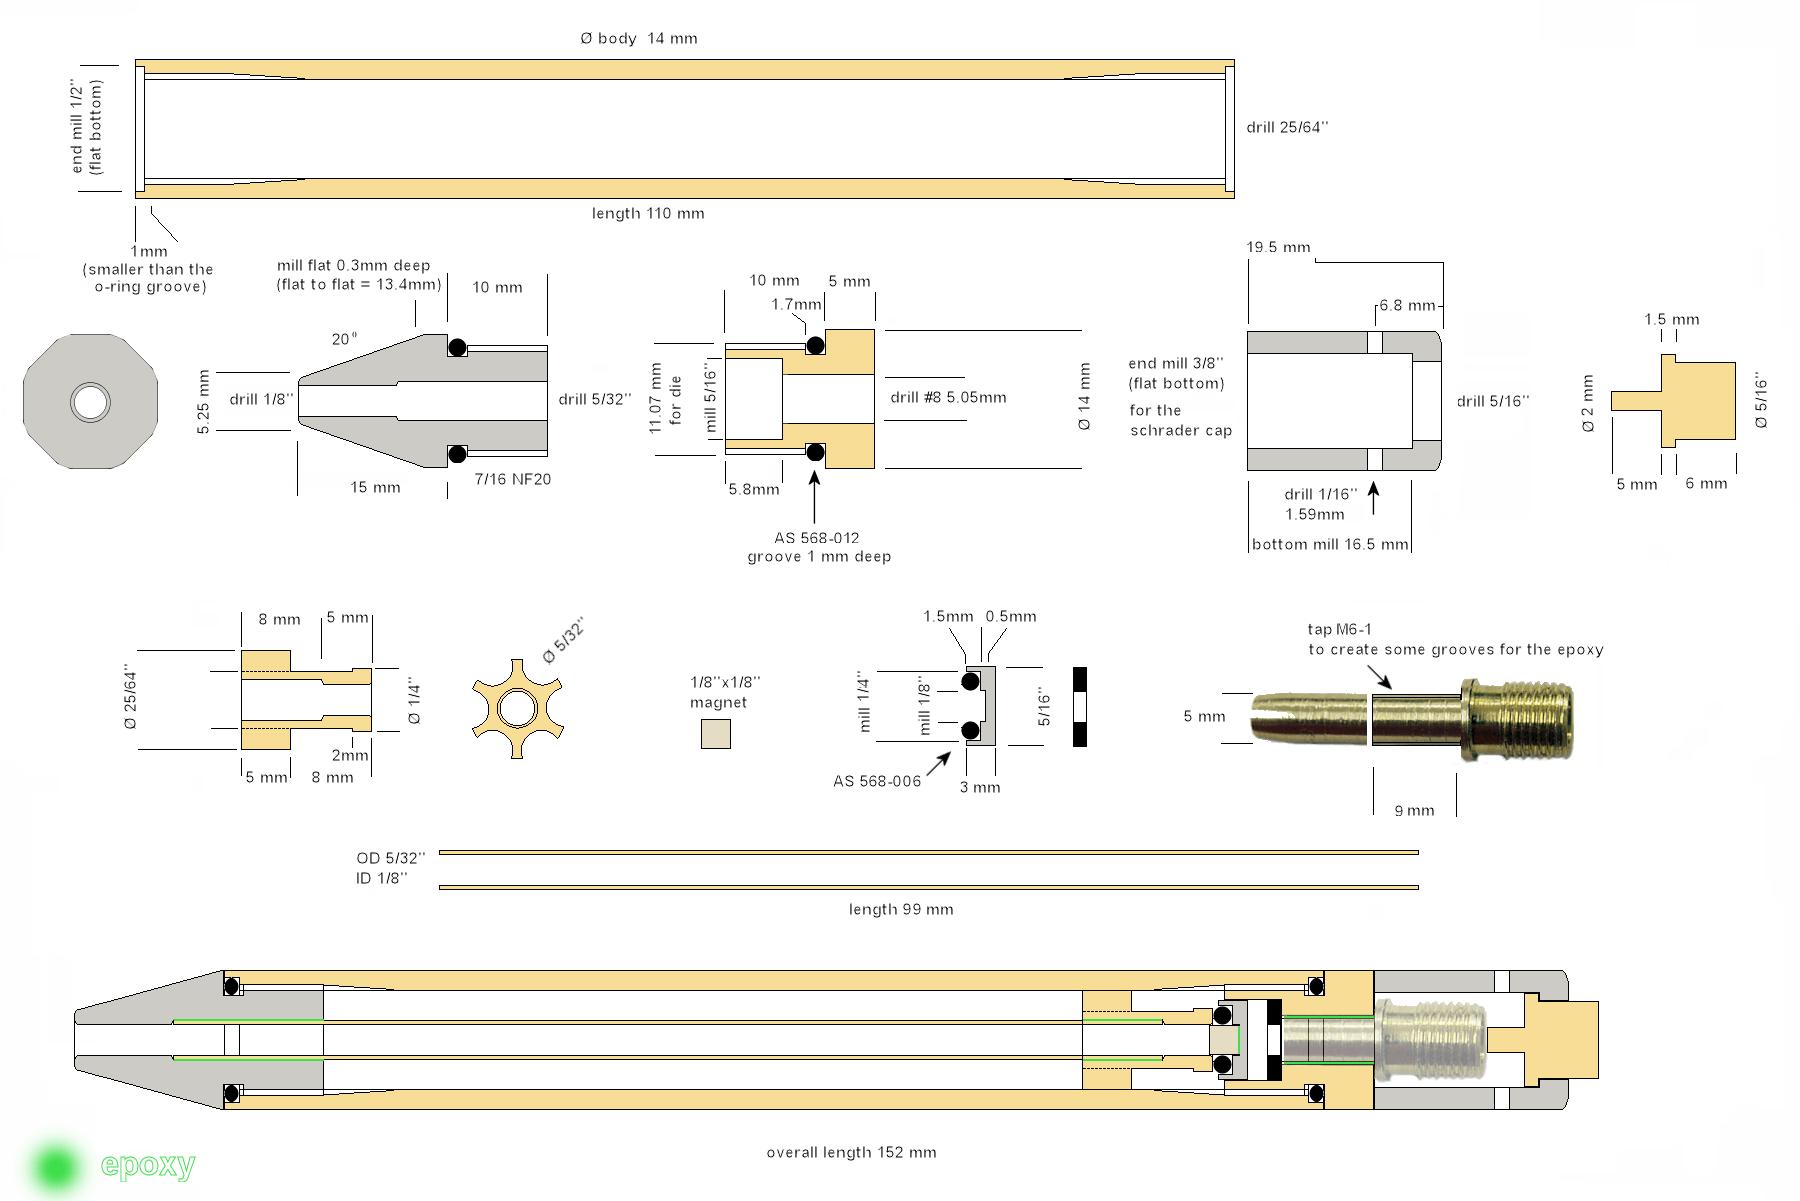 Pneumatic Potato Cannon Plans Gun Diagram